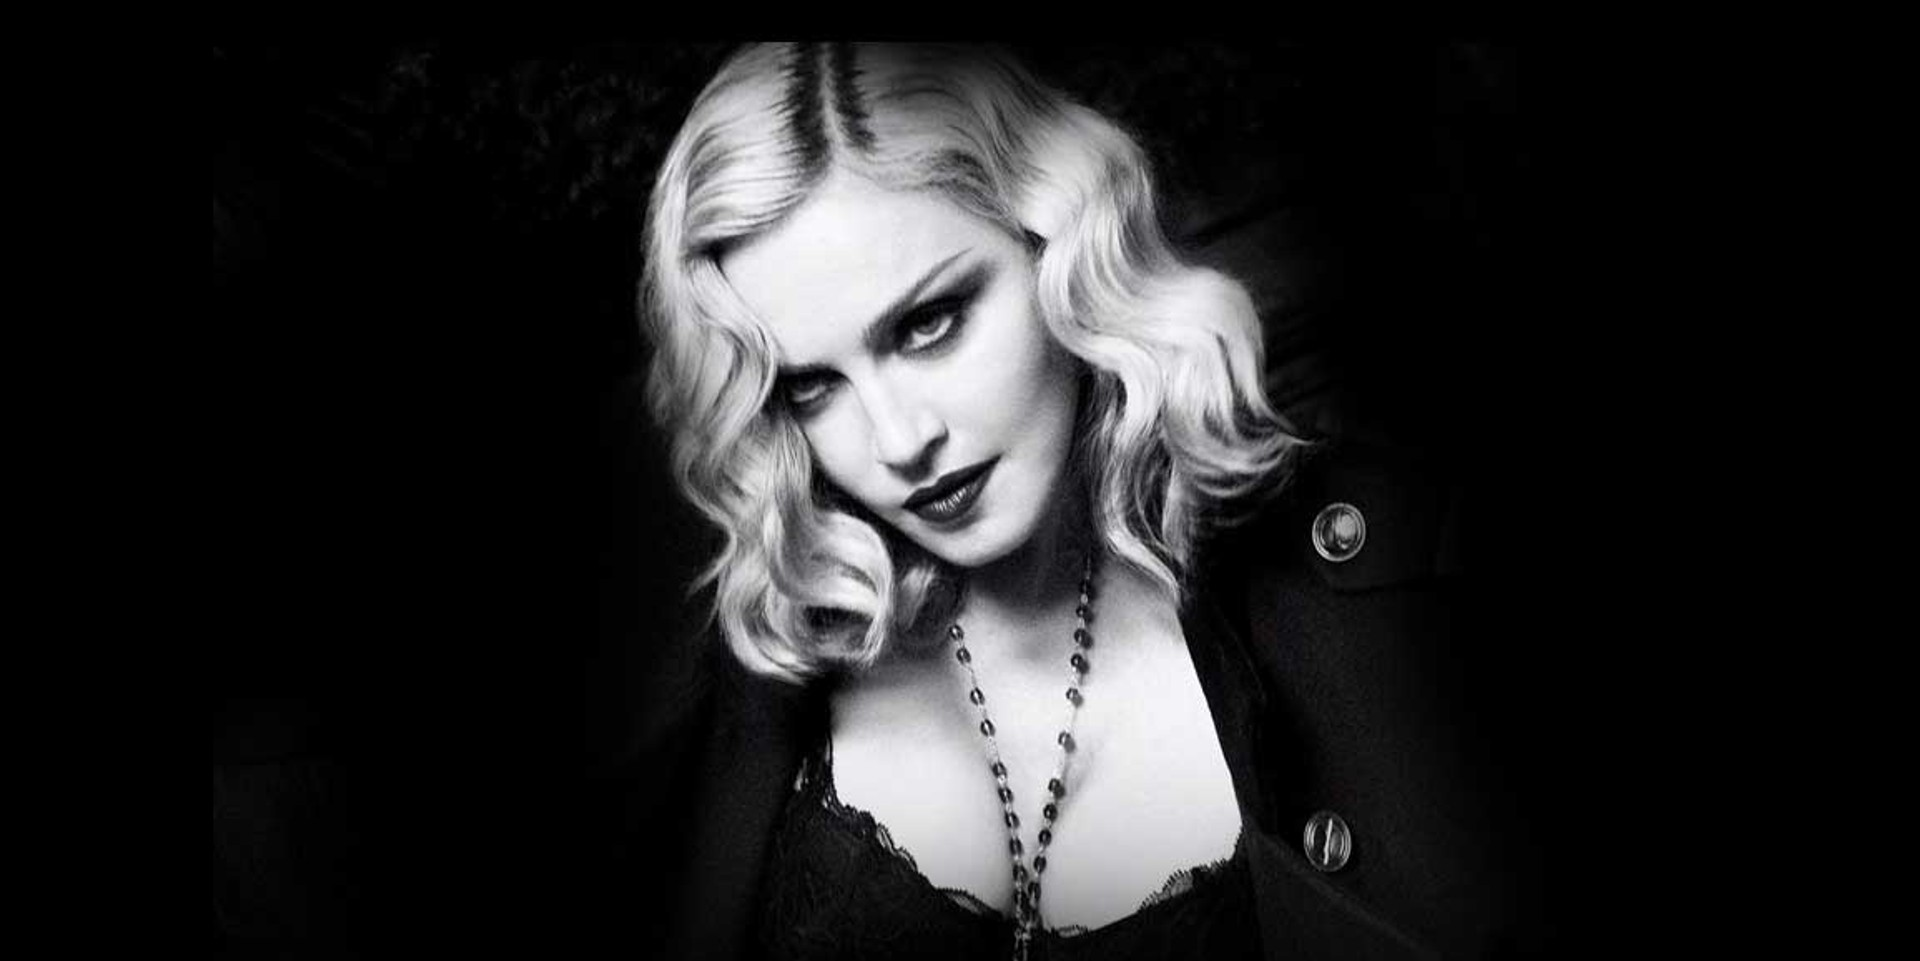 Madonna begins teasing new music